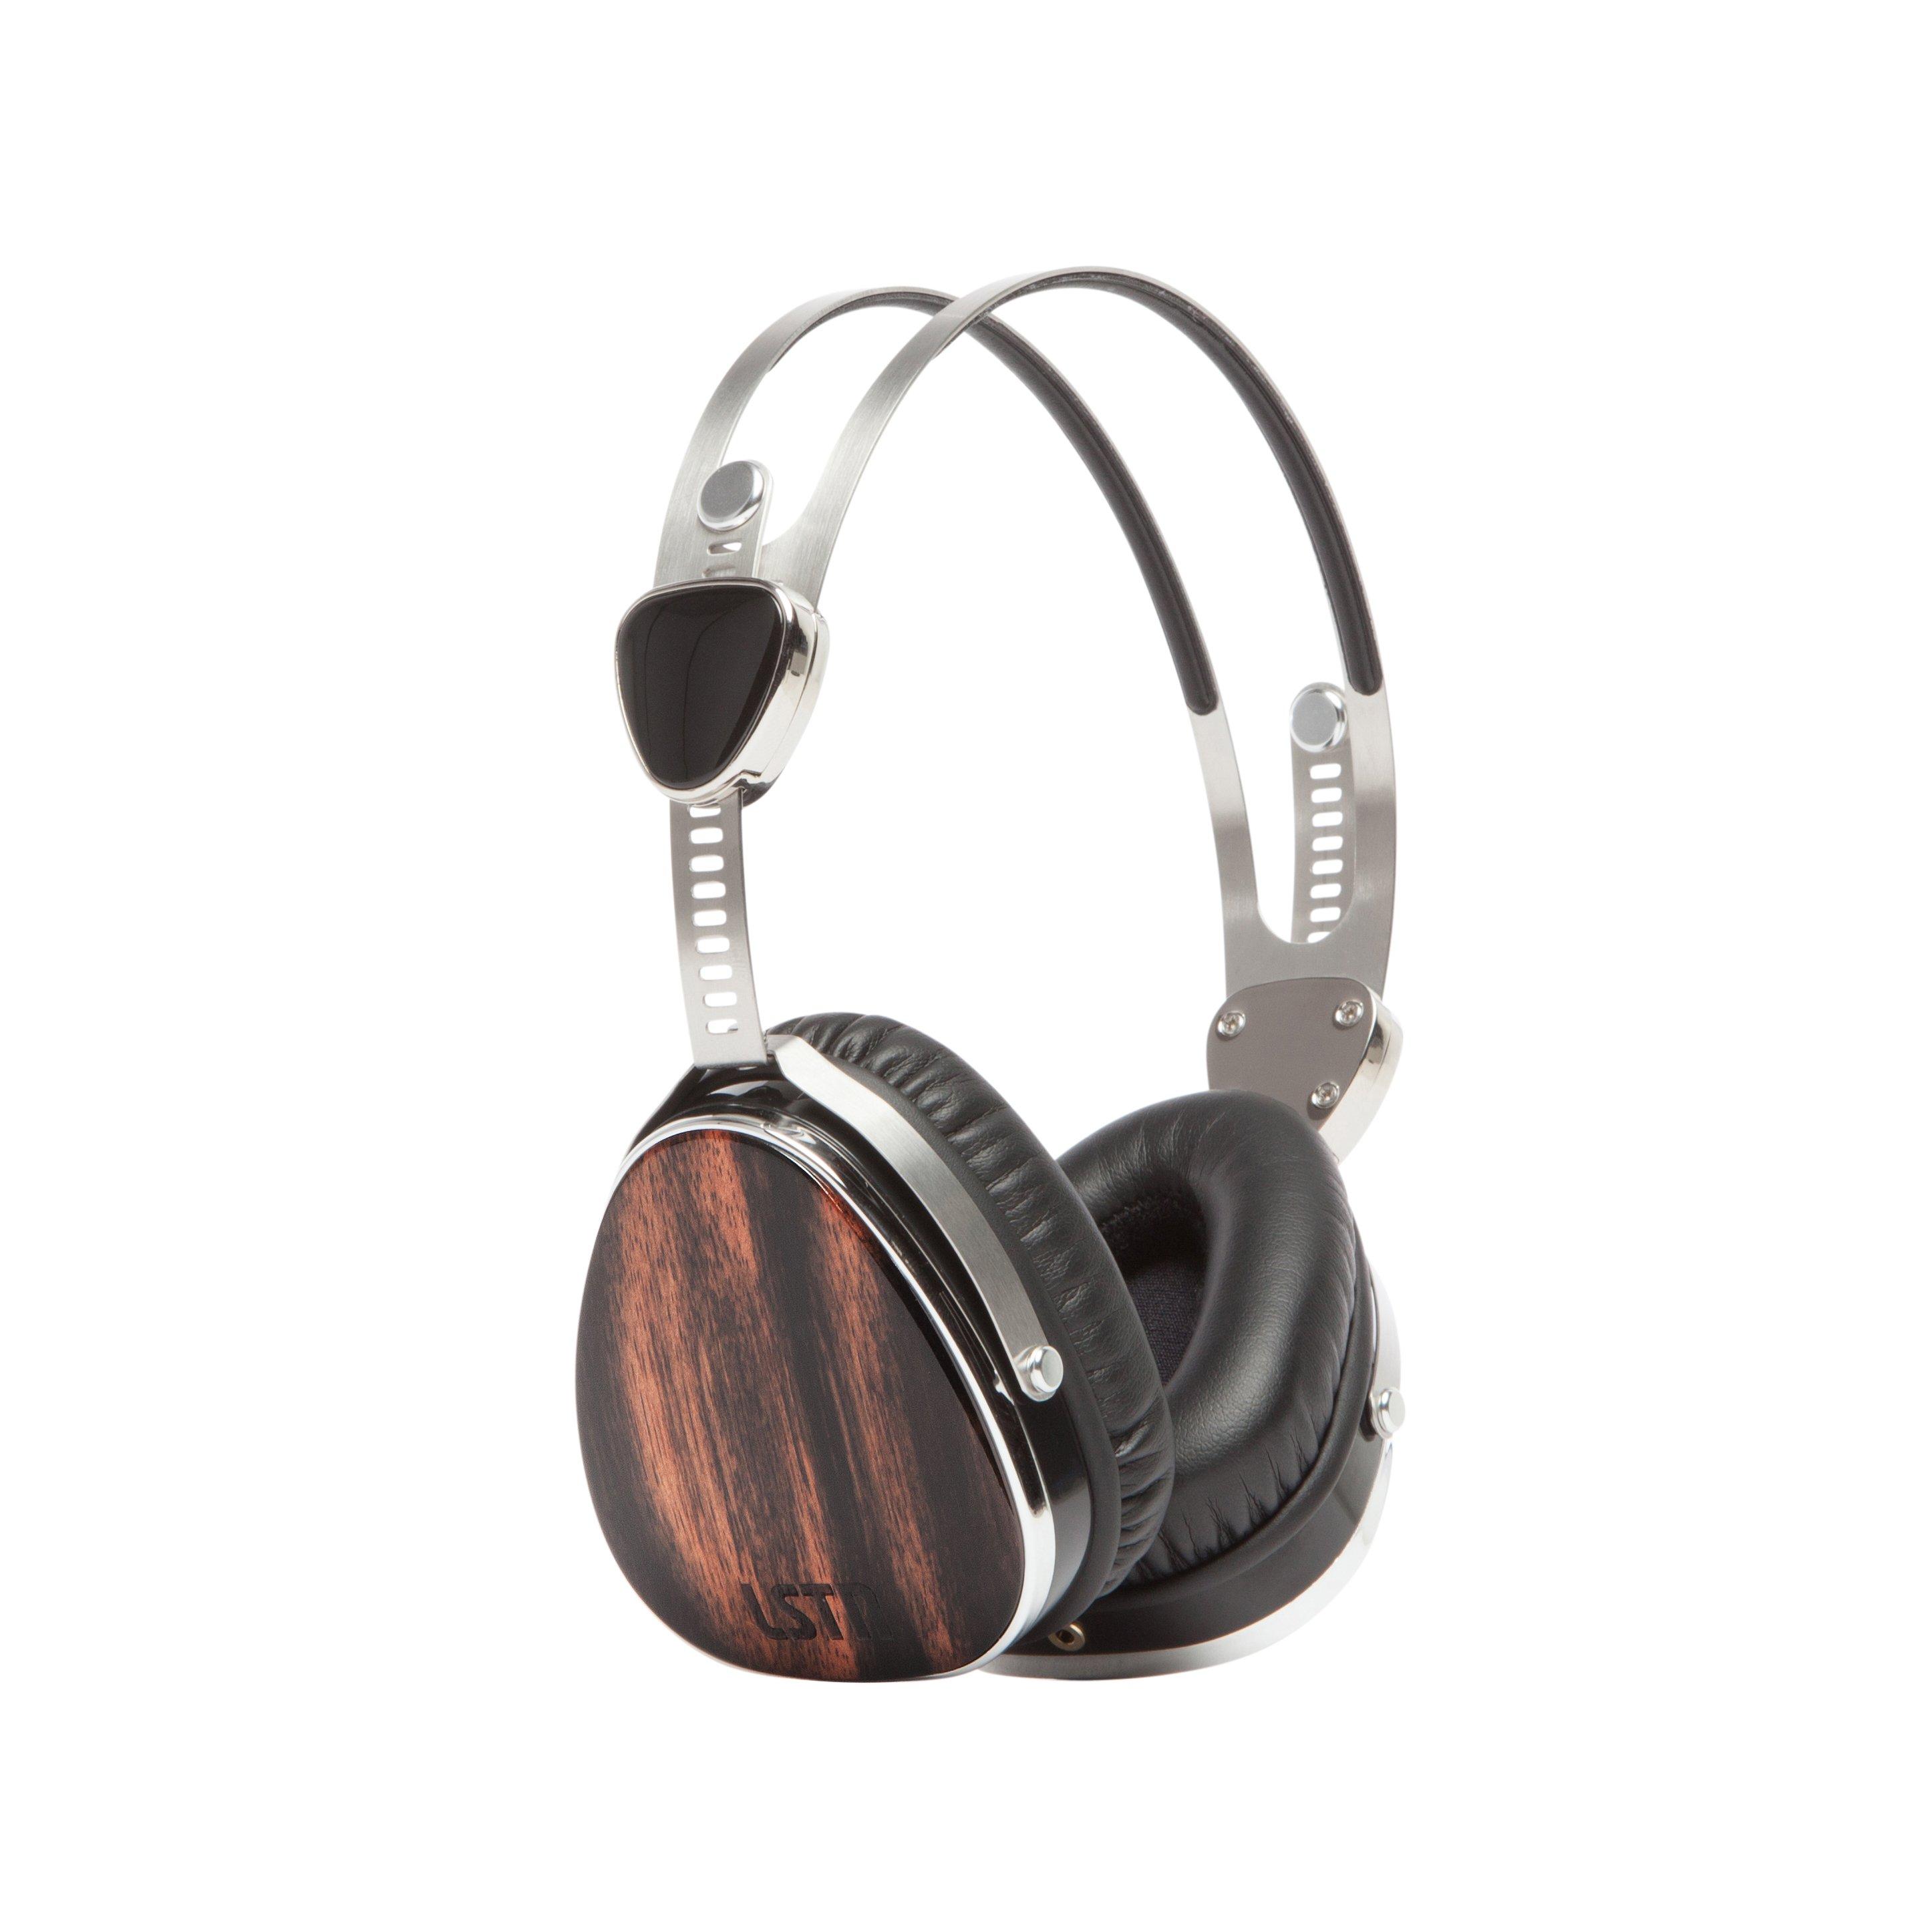 LSTN - Troubadour Headphones - Ebony